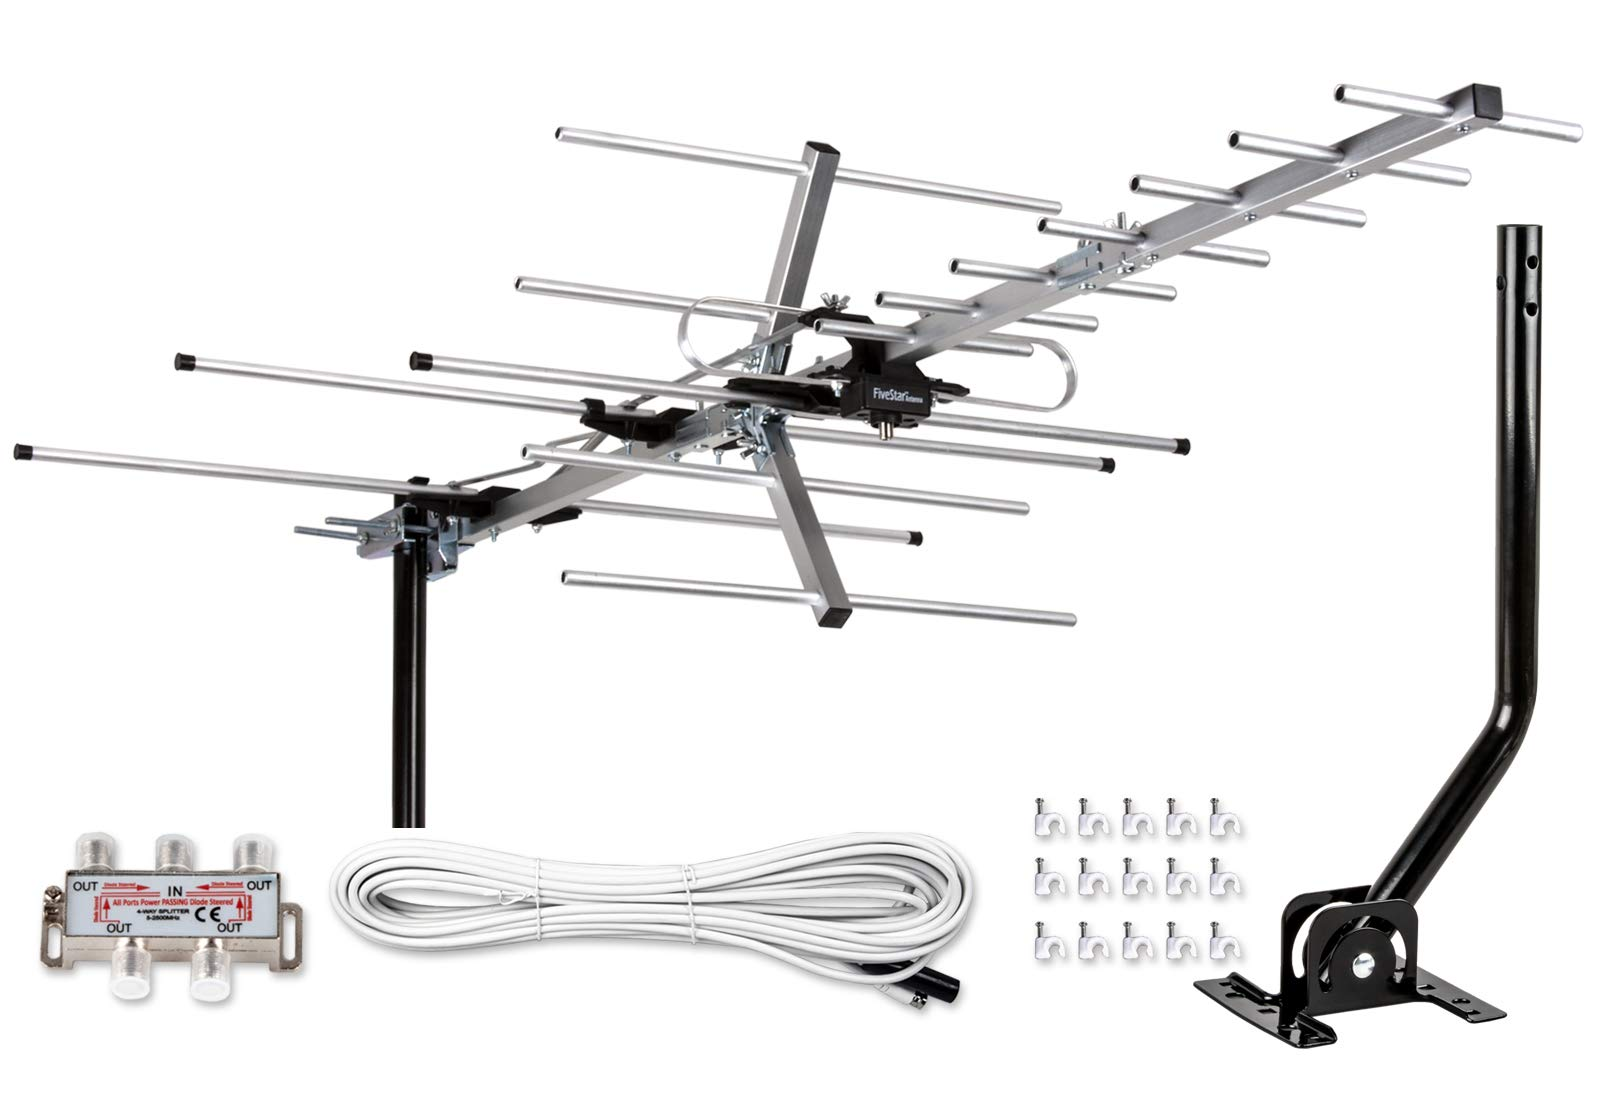 [Newest 2020] Five Star Yagi Satellite HD TV Antenna up to 200 Mile Range, Attic or Roof Mount TV Antenna, Long Range Digital OTA Antenna for 4K 1080P Supports 4 TVs Installation Kit & Mounting Pole